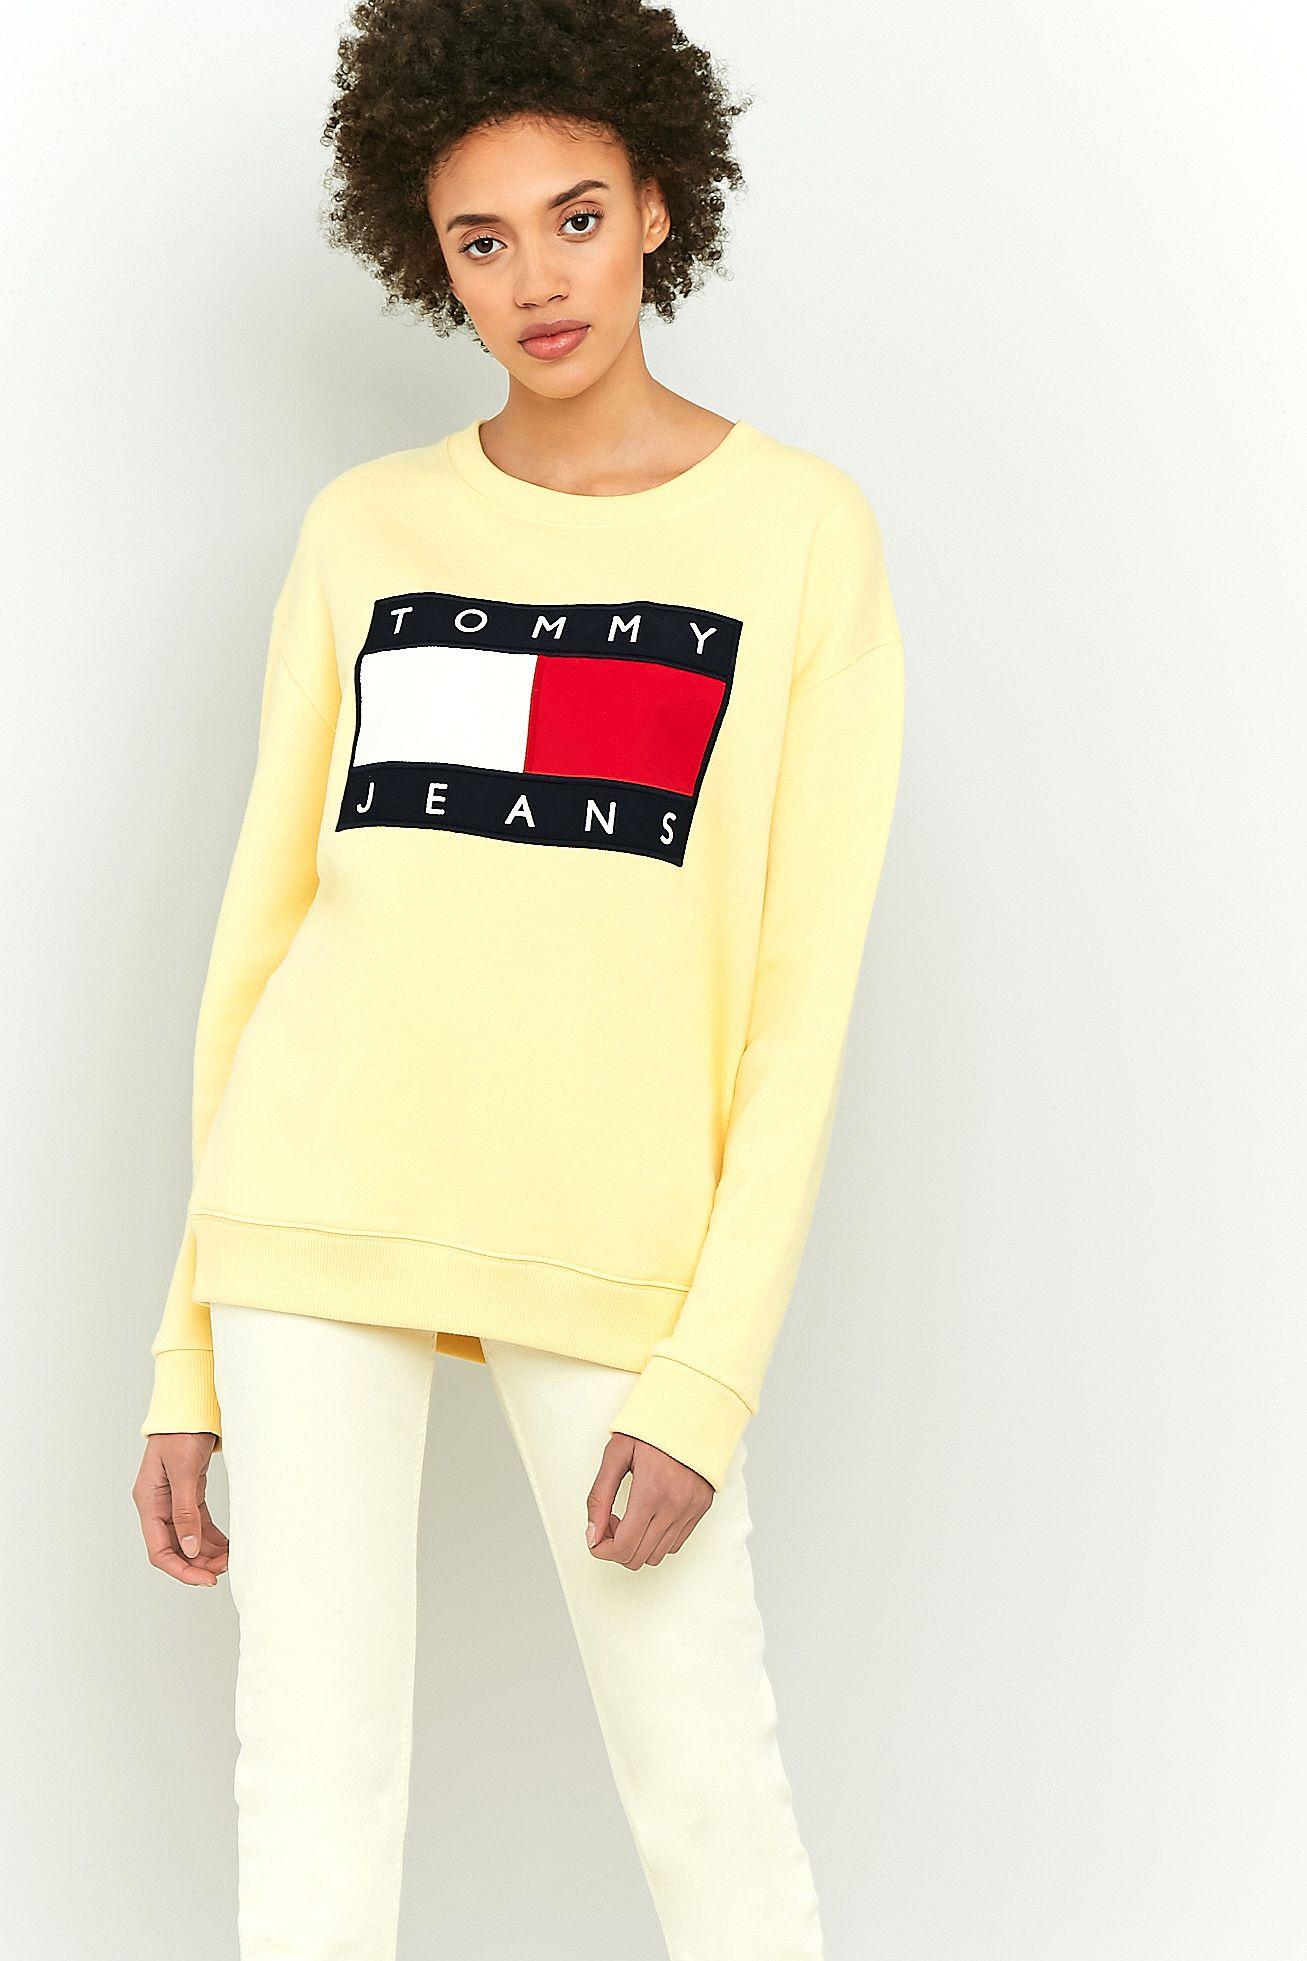 b7f63ad3405 Tommy Jeans  90s Yellow Logo Sweatshirt